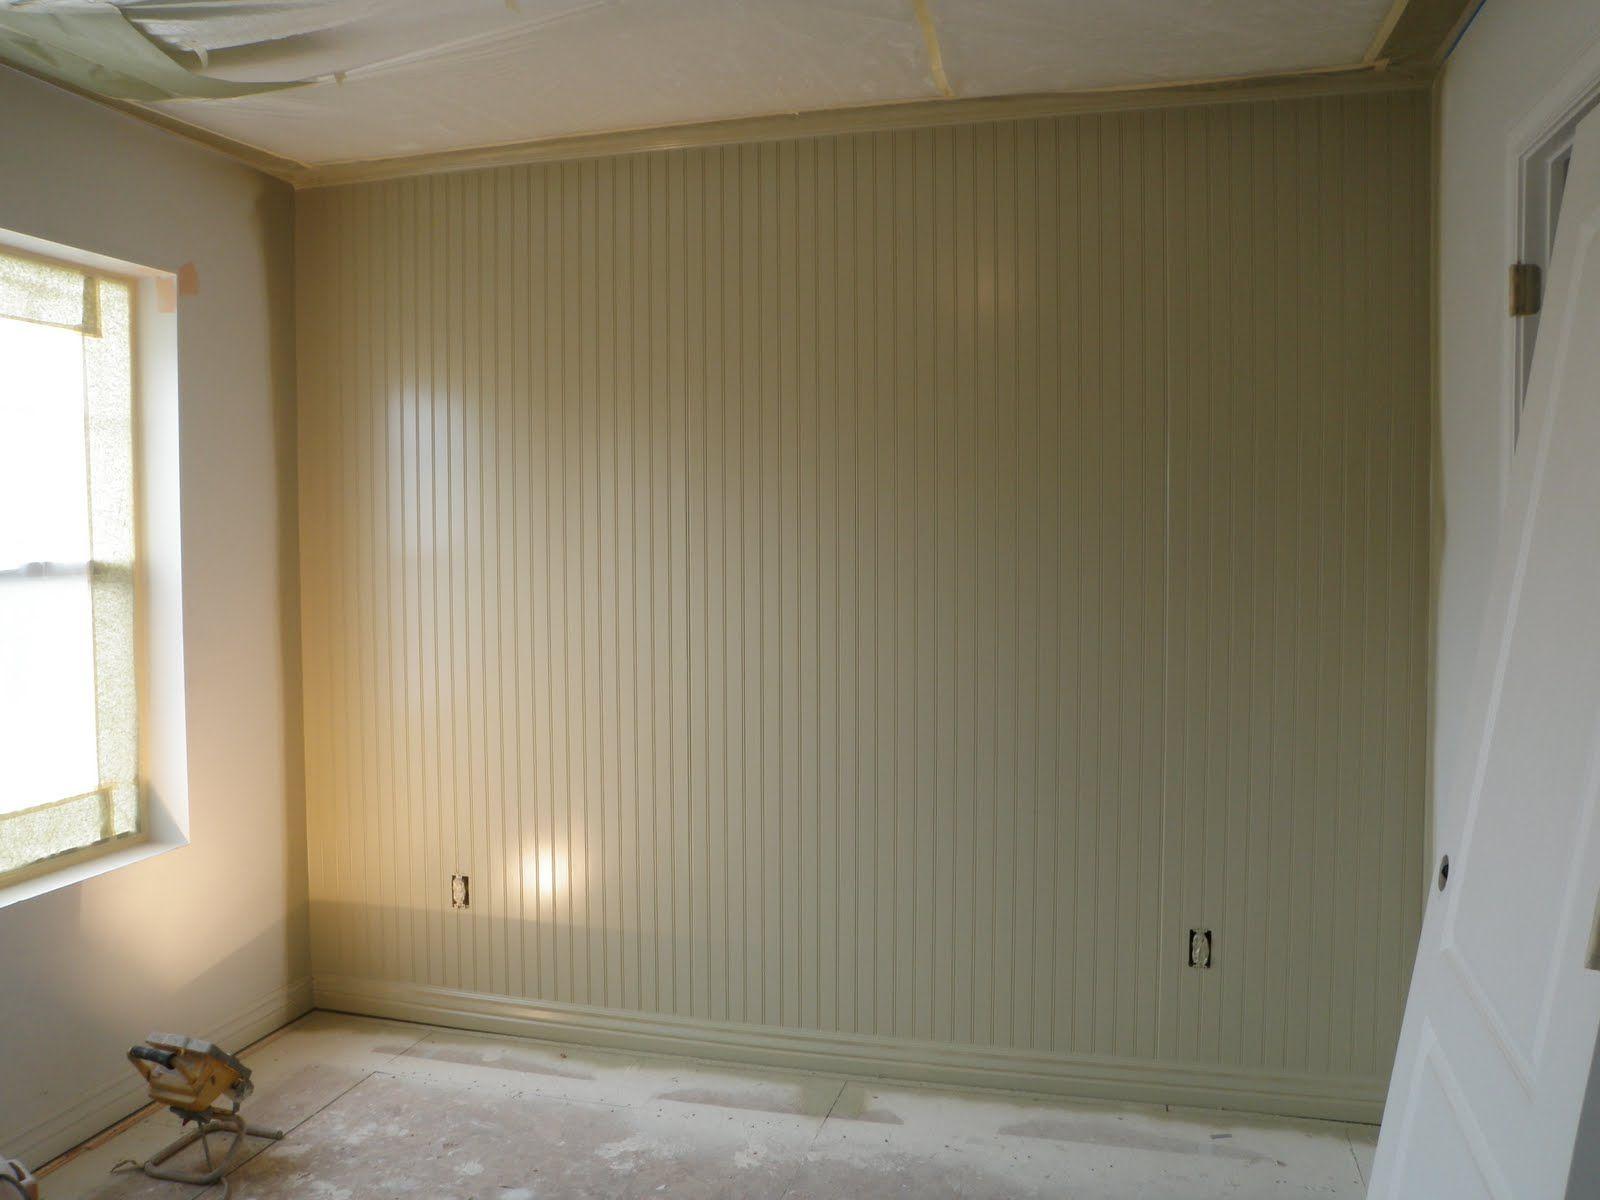 Beadboard Walls Dark Beadboard Vs Wainscoting Beadboard Walls Bead Board Walls Beadboard White Beadboard